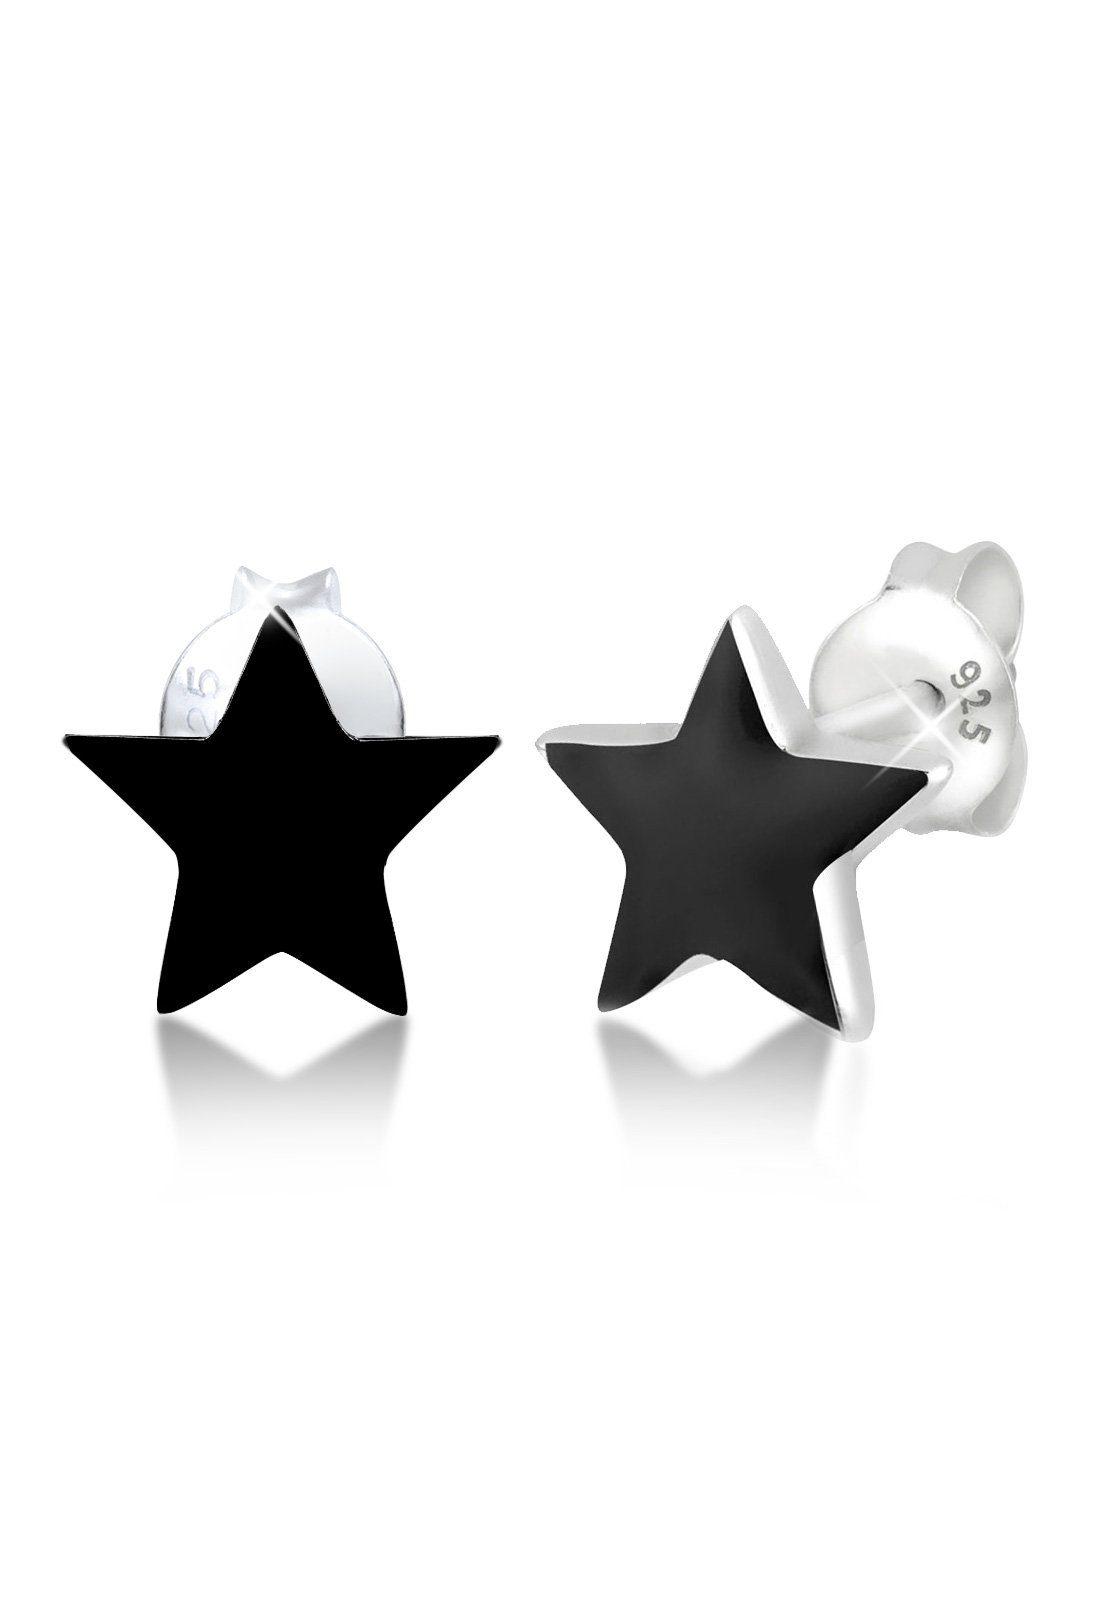 925 Sterlingsilber Ohrstecker Ohrringe Ohrklemme Stern Spirale Sterne Silber Edelmetall ohne Steine